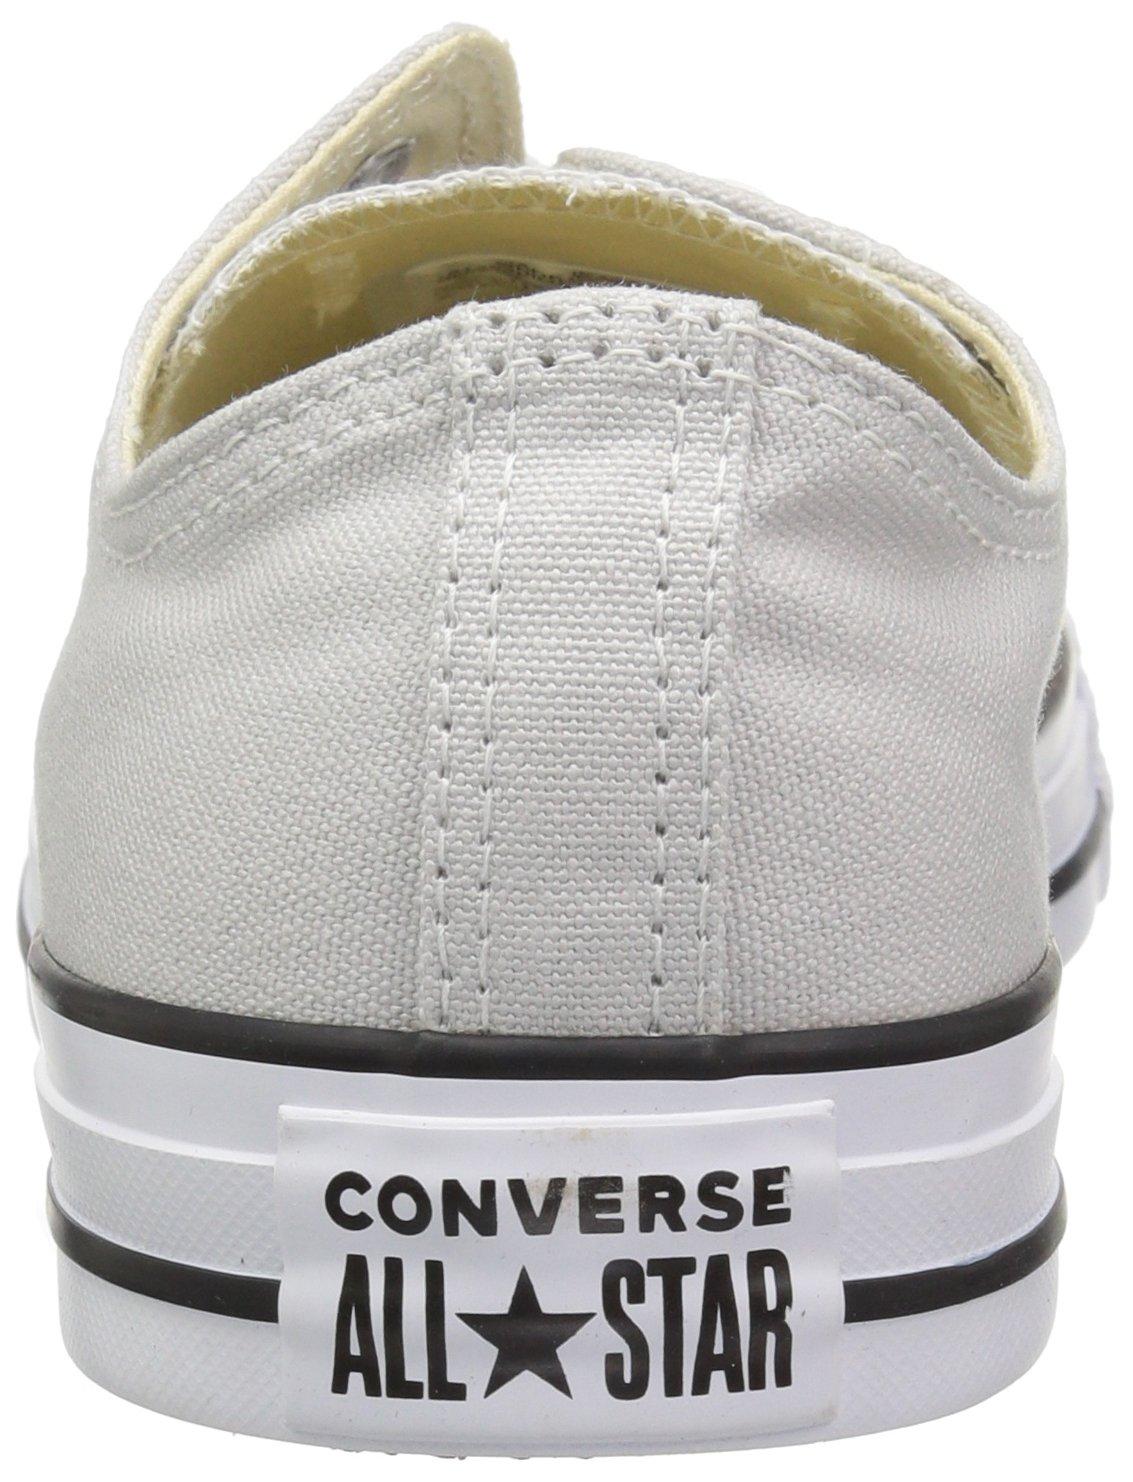 Converse Women's Chuck Taylor All Star 2018 Seasonal Low Top Sneaker B078NGK7ZJ 3 M US|Mouse